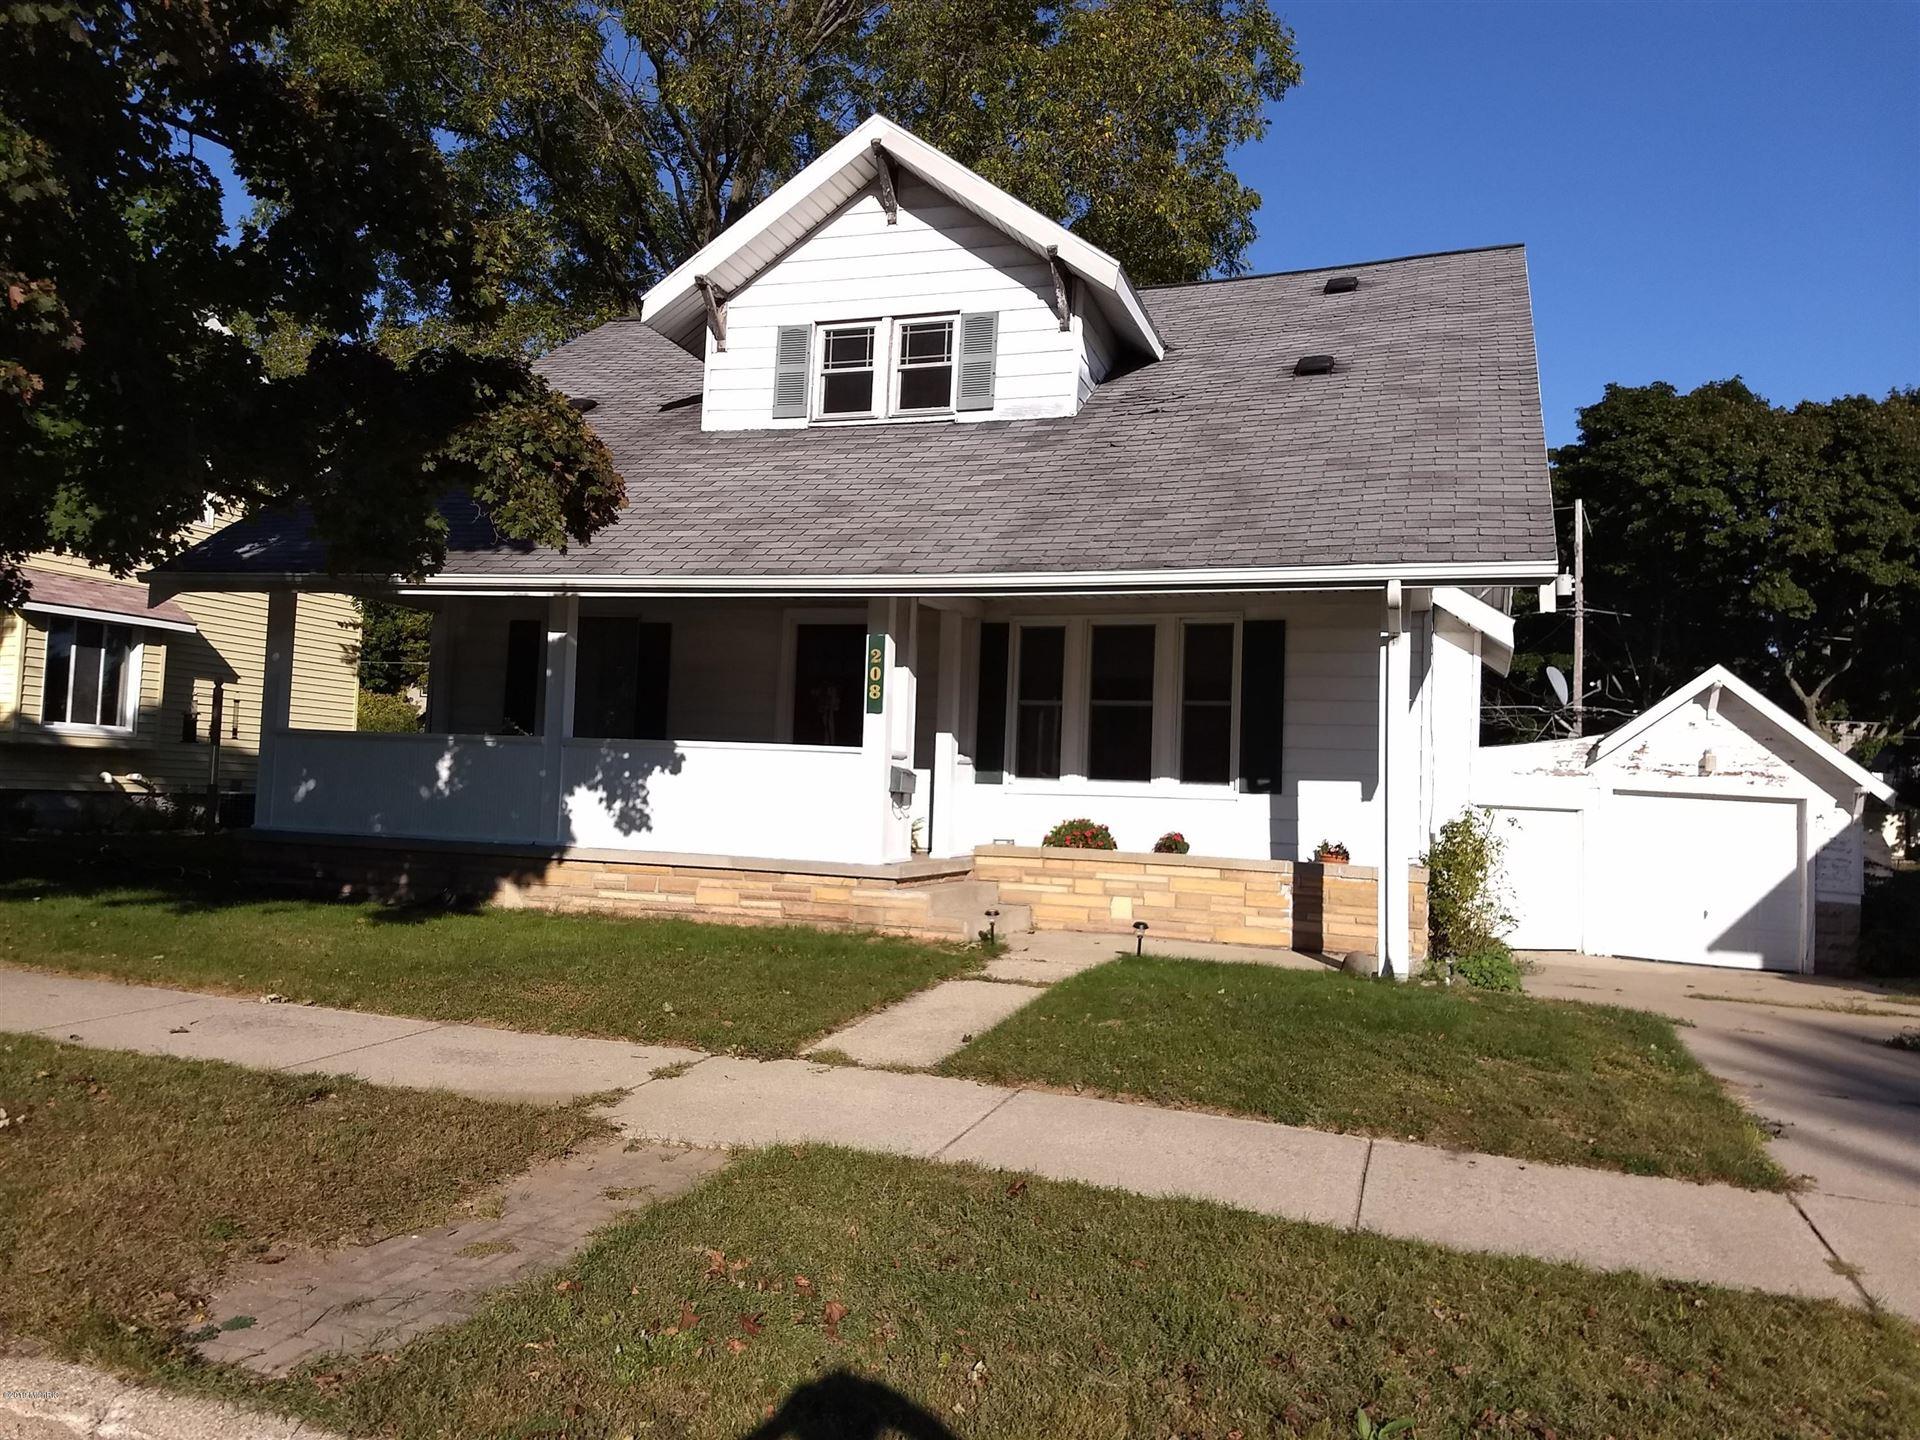 208 N Robert Street, Ludington, MI 49431 - MLS#: 21026712